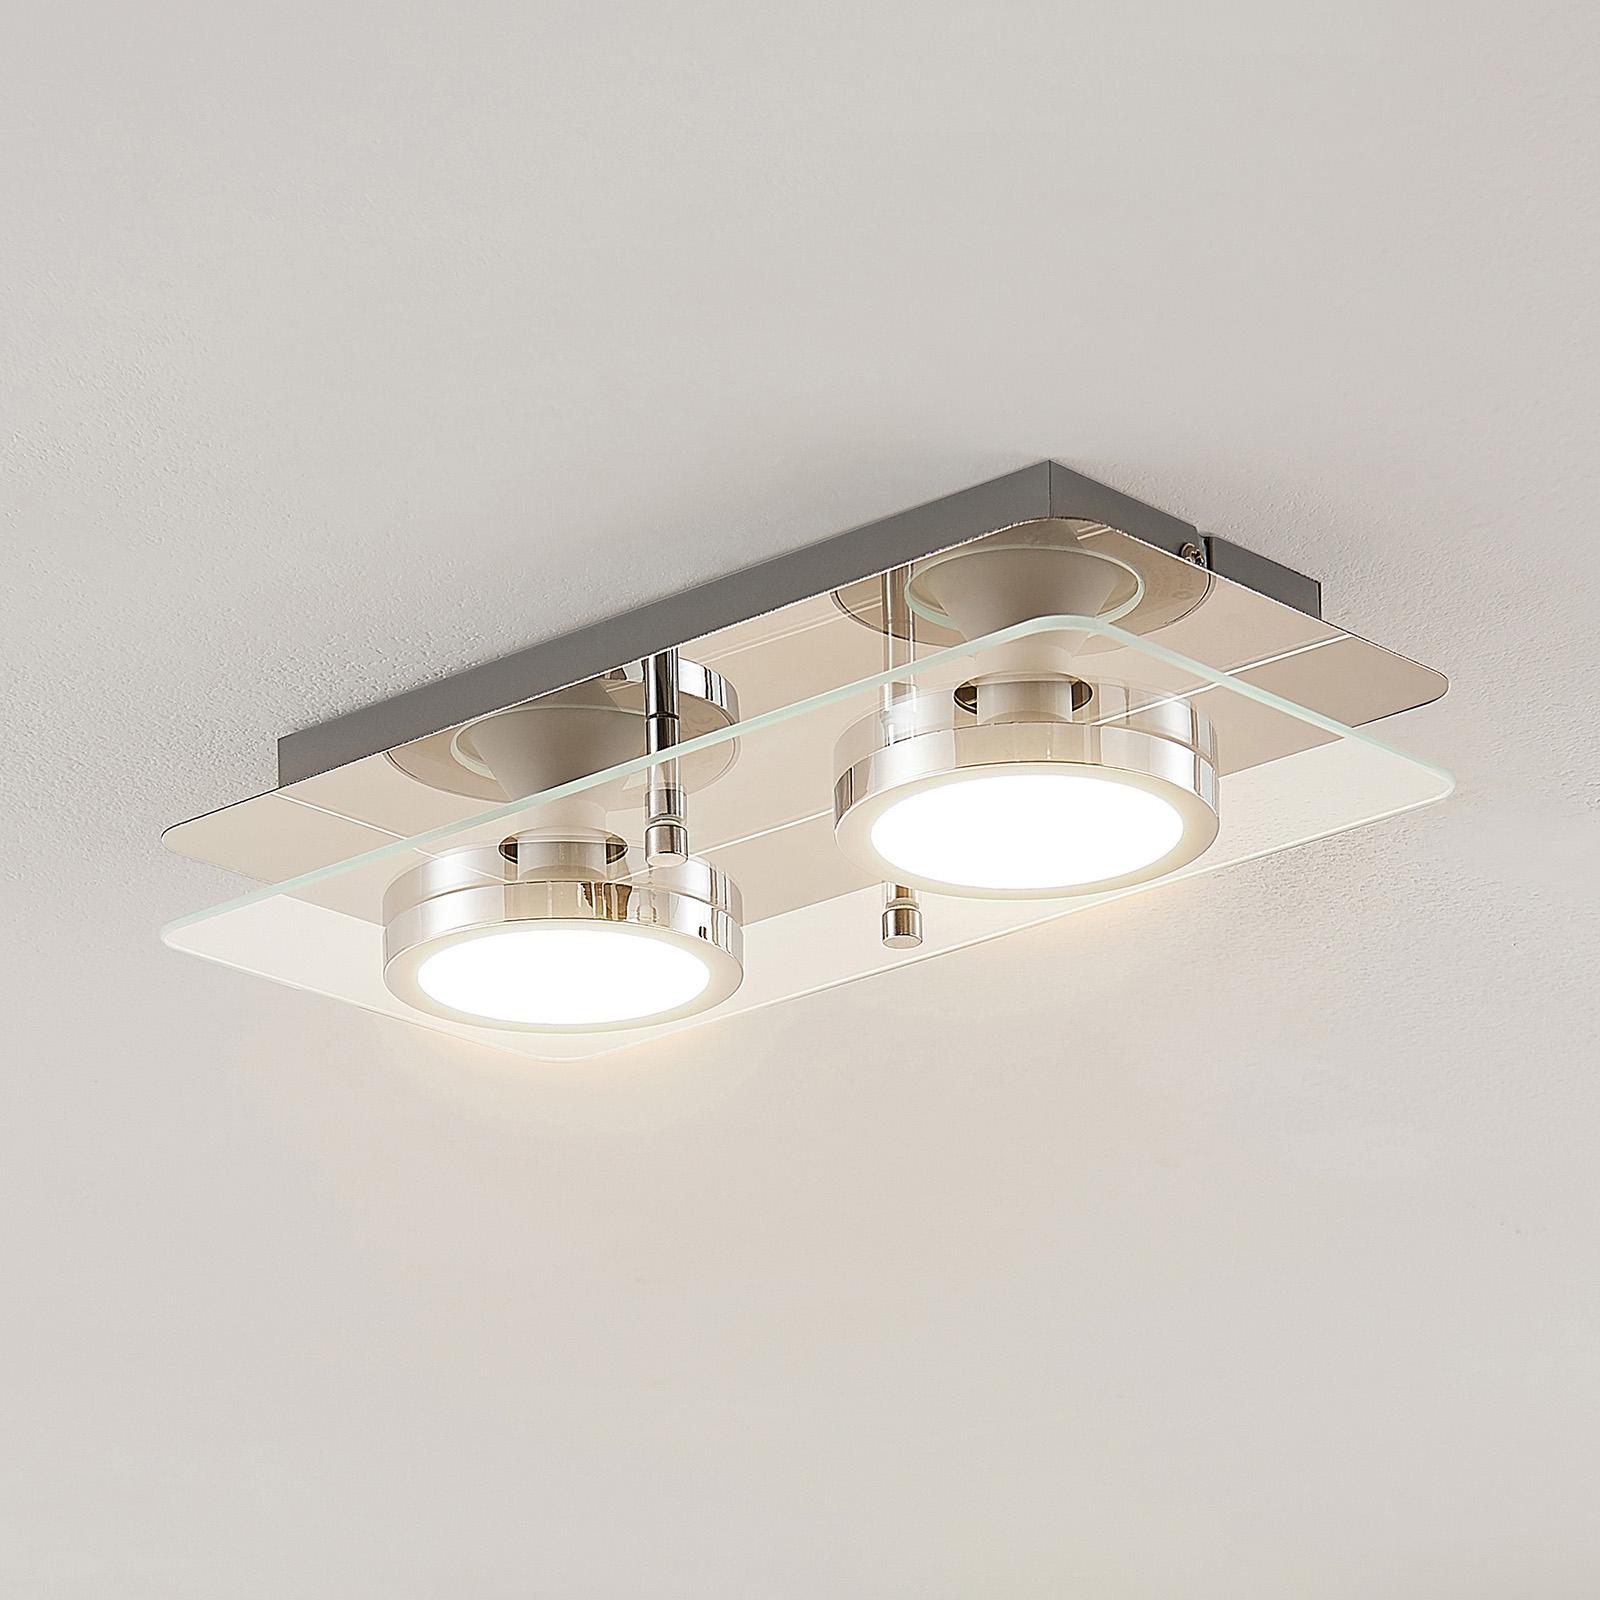 Lindby Gabryl LED-taklampe, 2 lyskilder